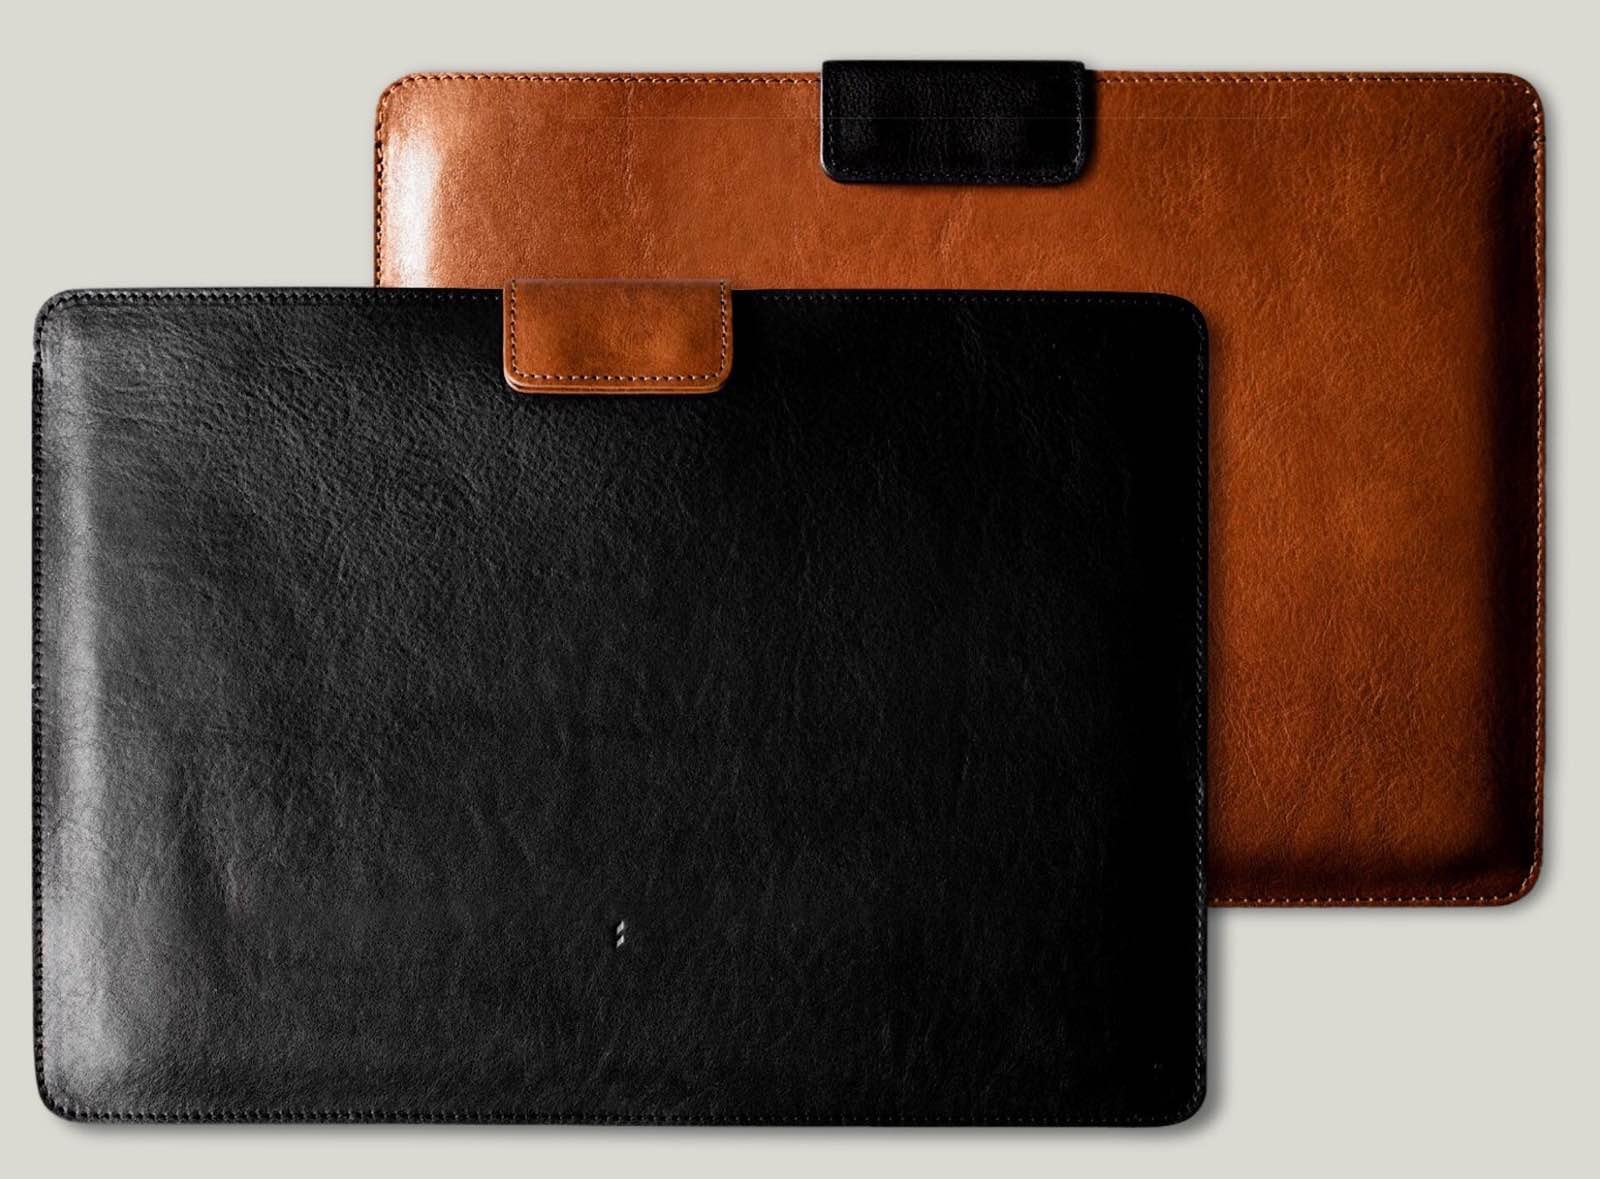 hard-graft-together-leather-ipad-pro-case